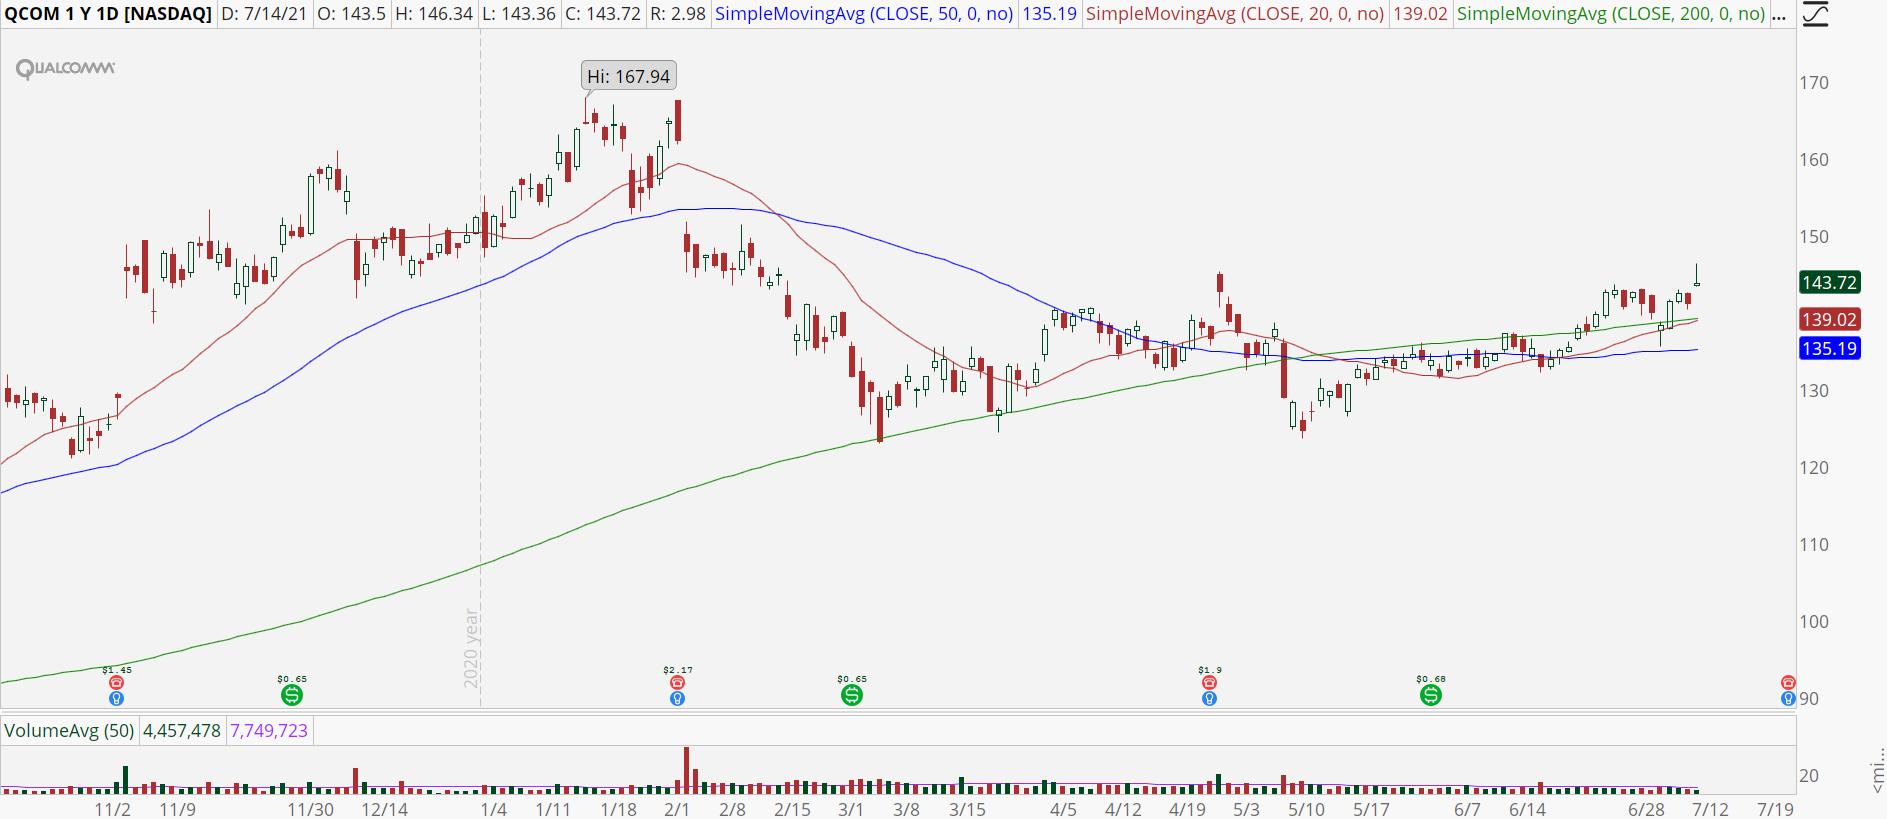 Qualcomm (QCOM) stock chart with bullish breakout